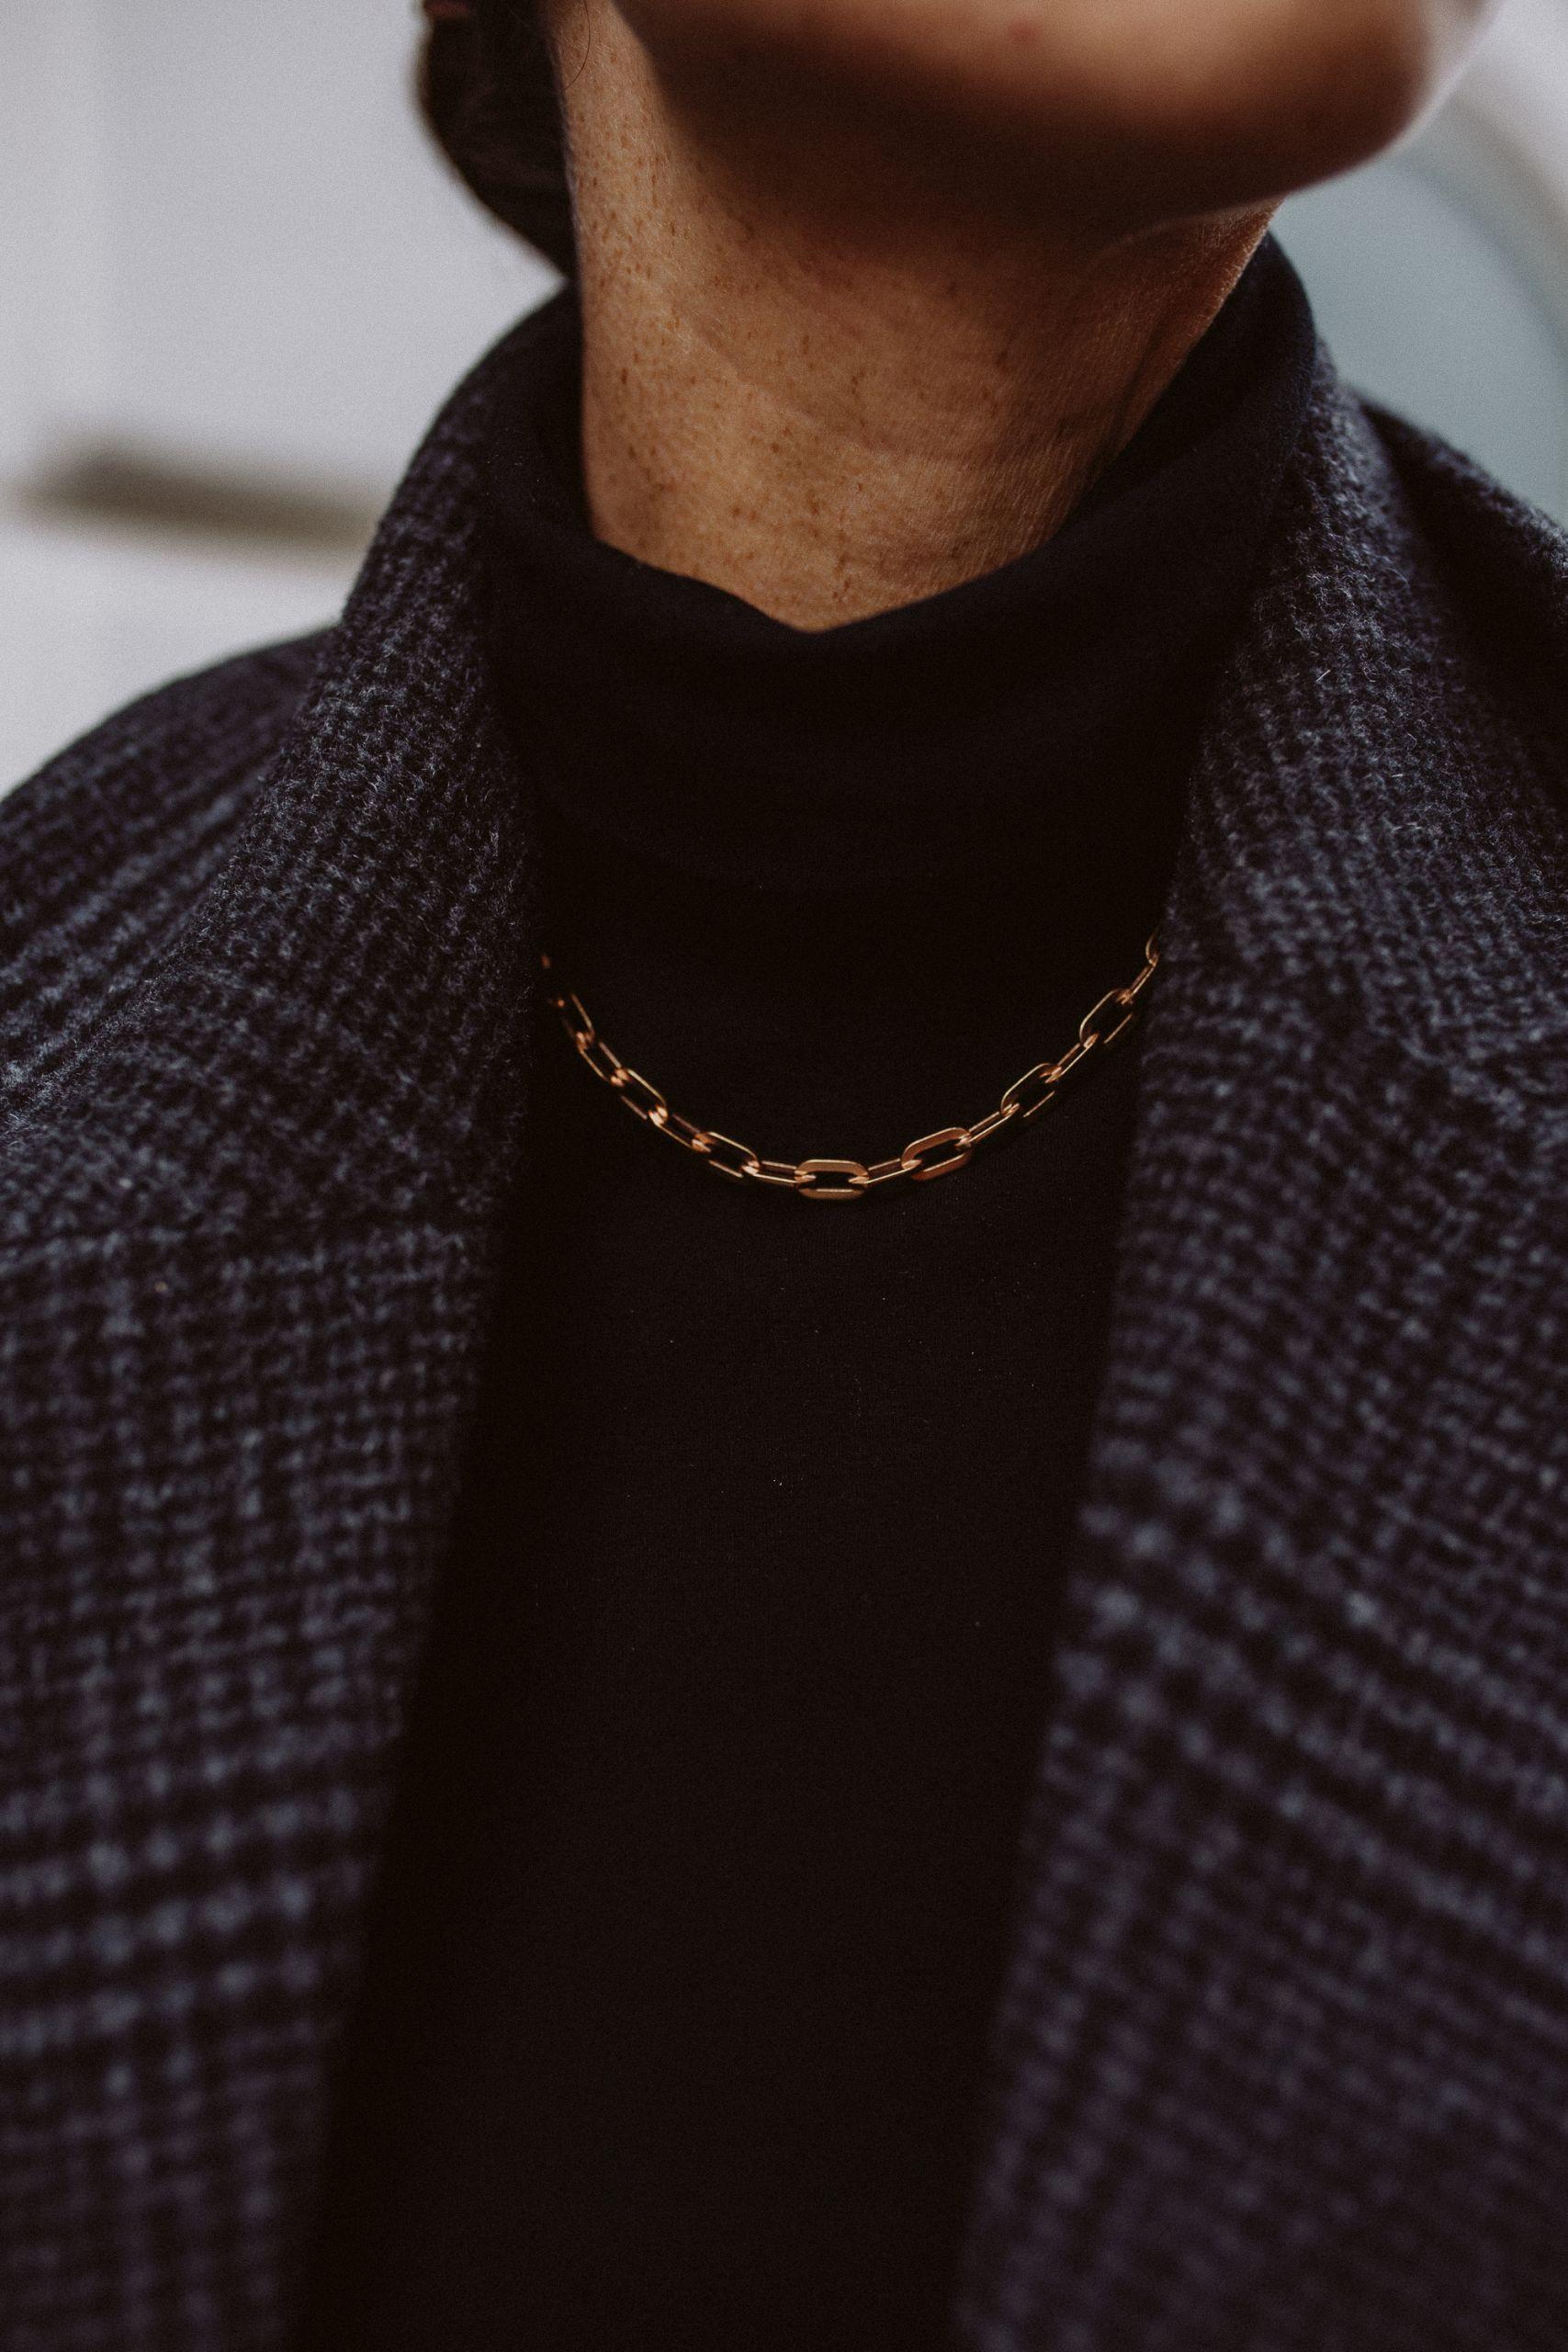 Chunky Chain Trend: Grobgliedrige Ketten jetzt im Trend - Love Daily Dose